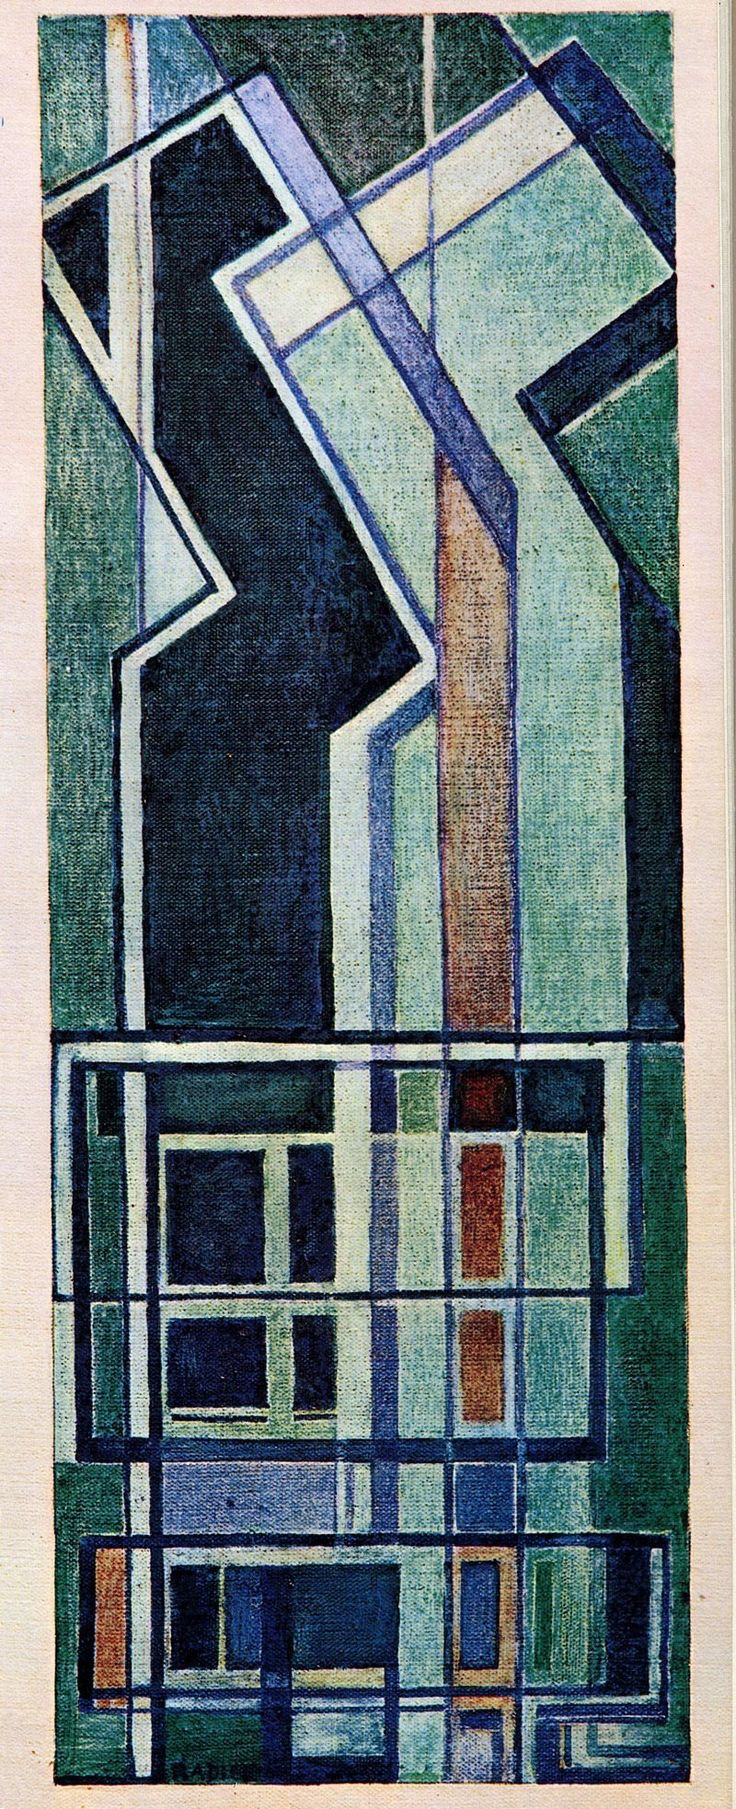 Mario Radice, Composizione R.S. 114 az., 1963